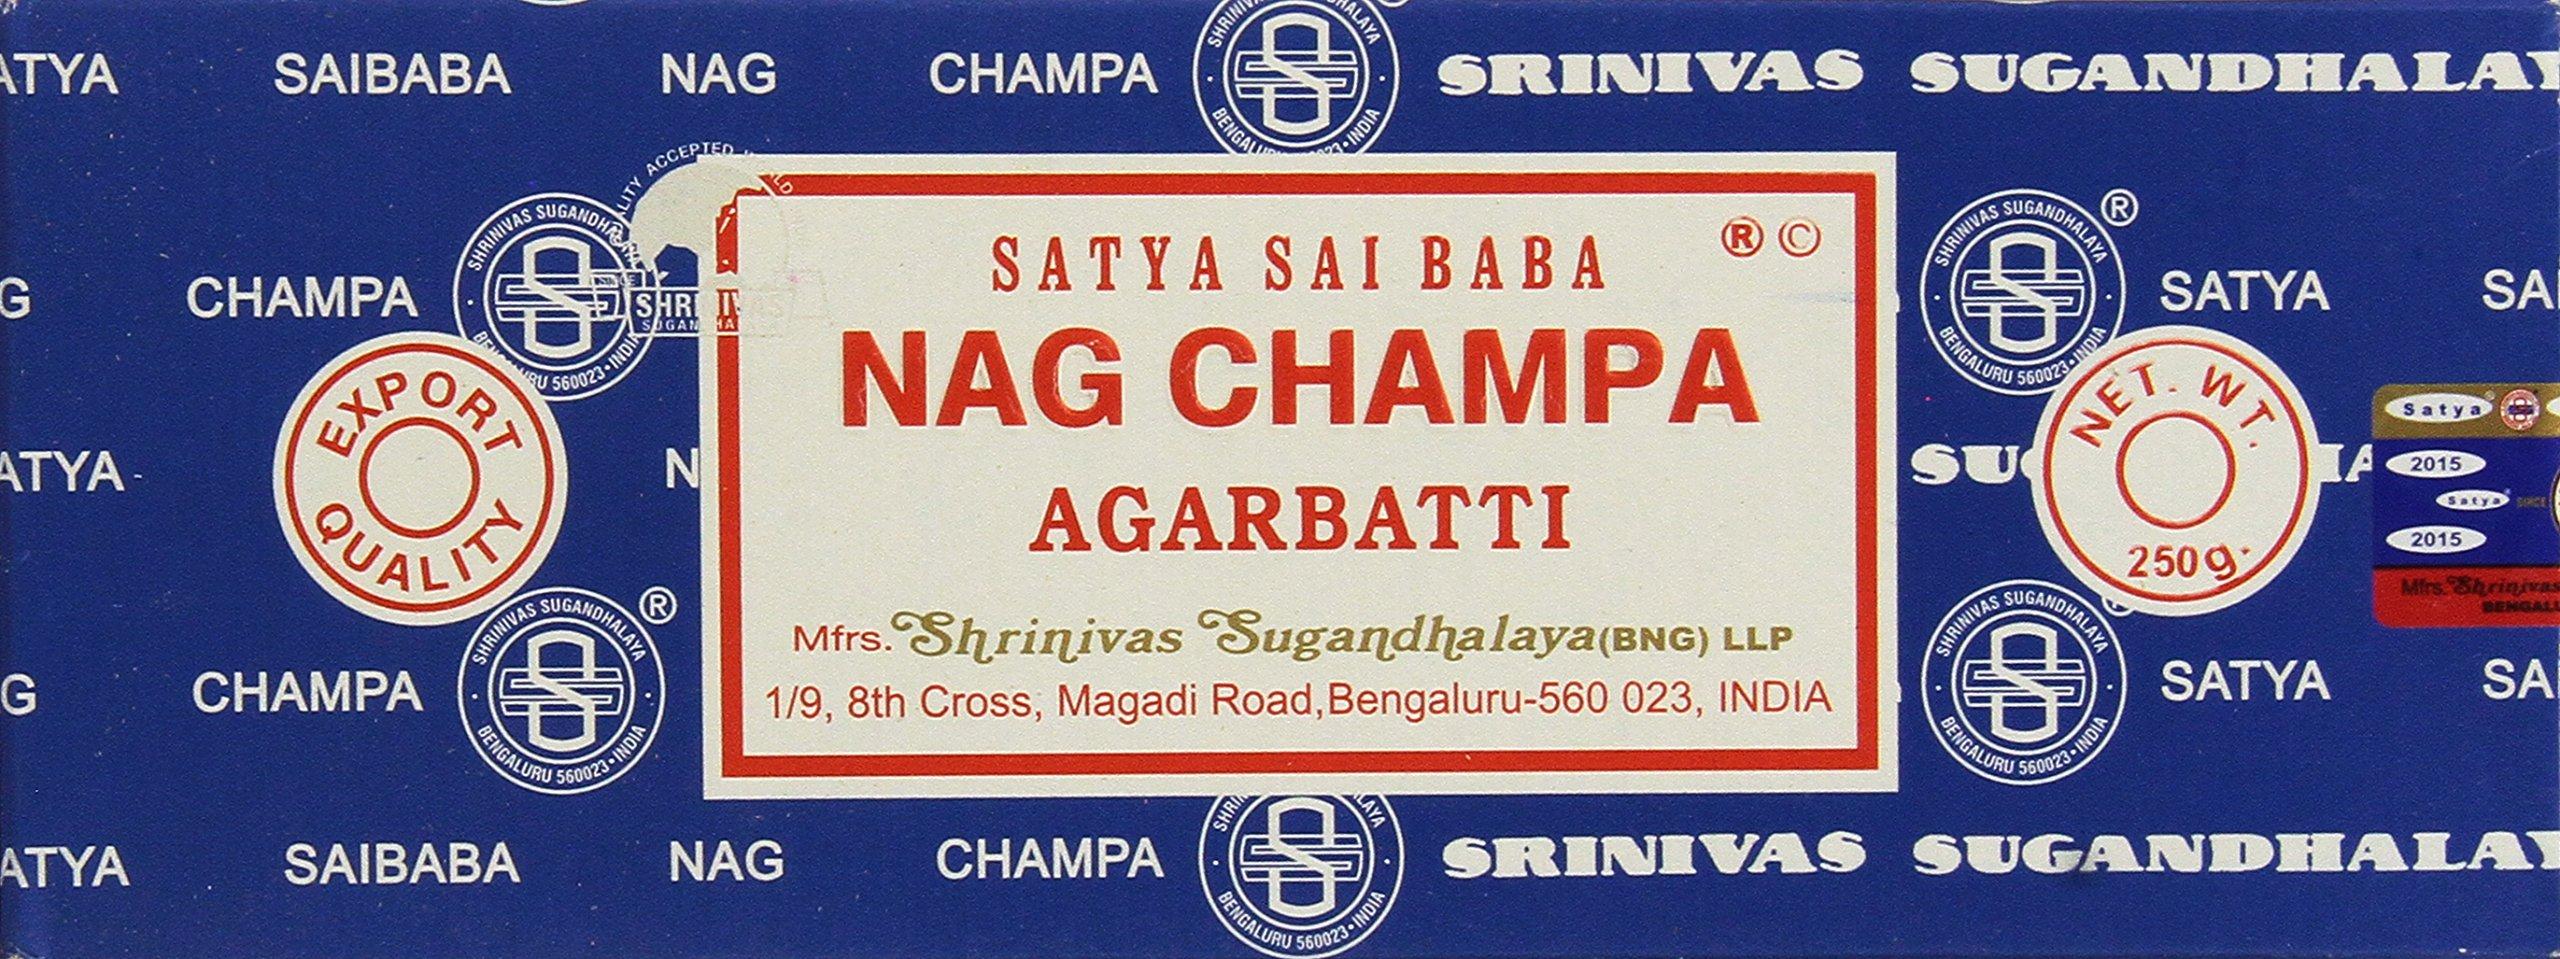 Satya Sai Baba Nag Champa Agarbatti, 250 G Pack of 2